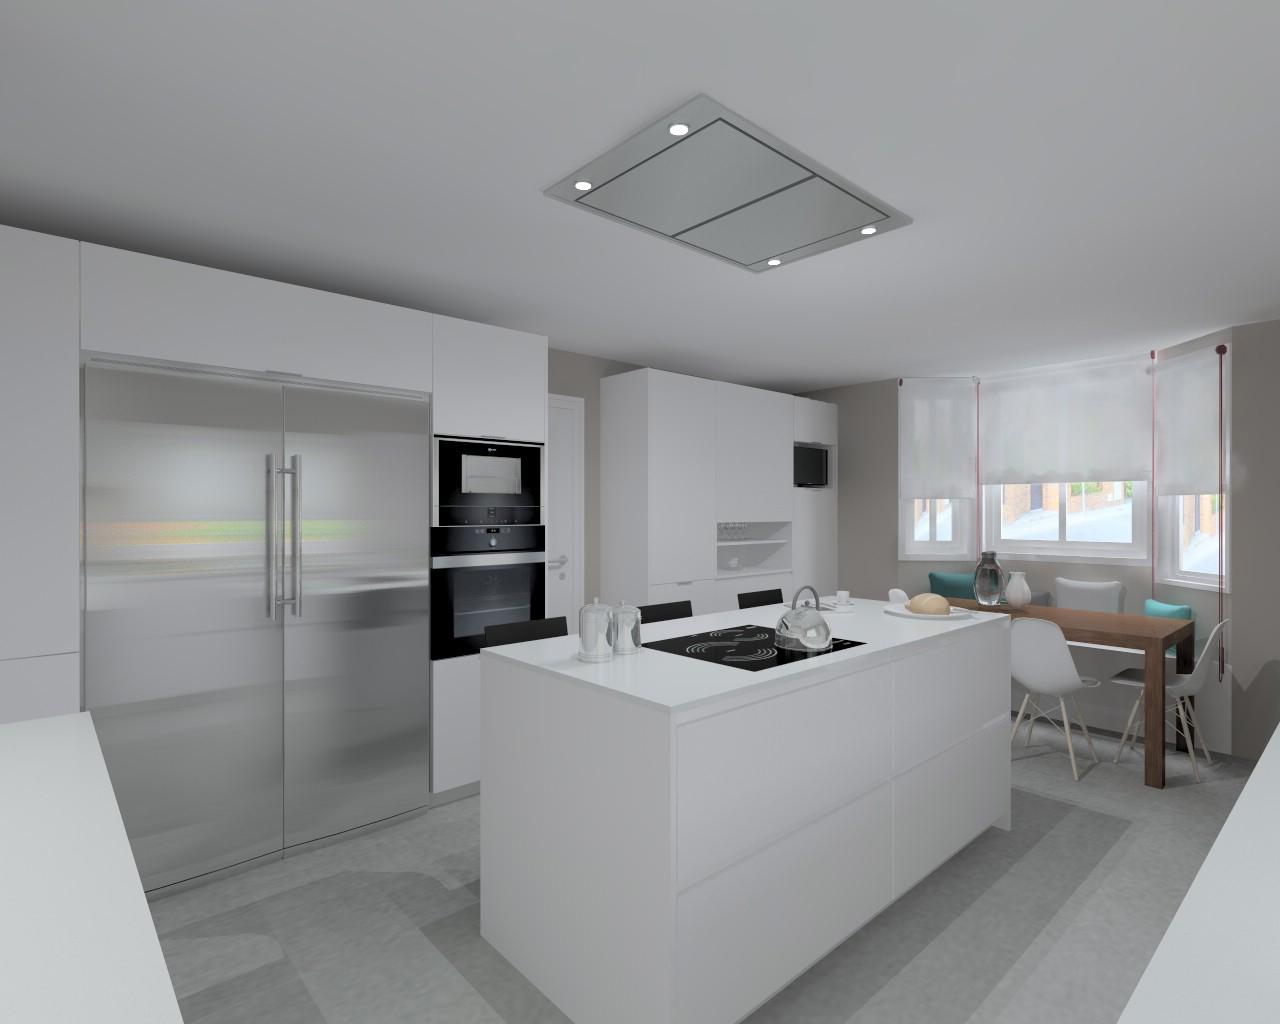 Proyectos de cocinas docrys cocinas - Cocina blanca mate ...